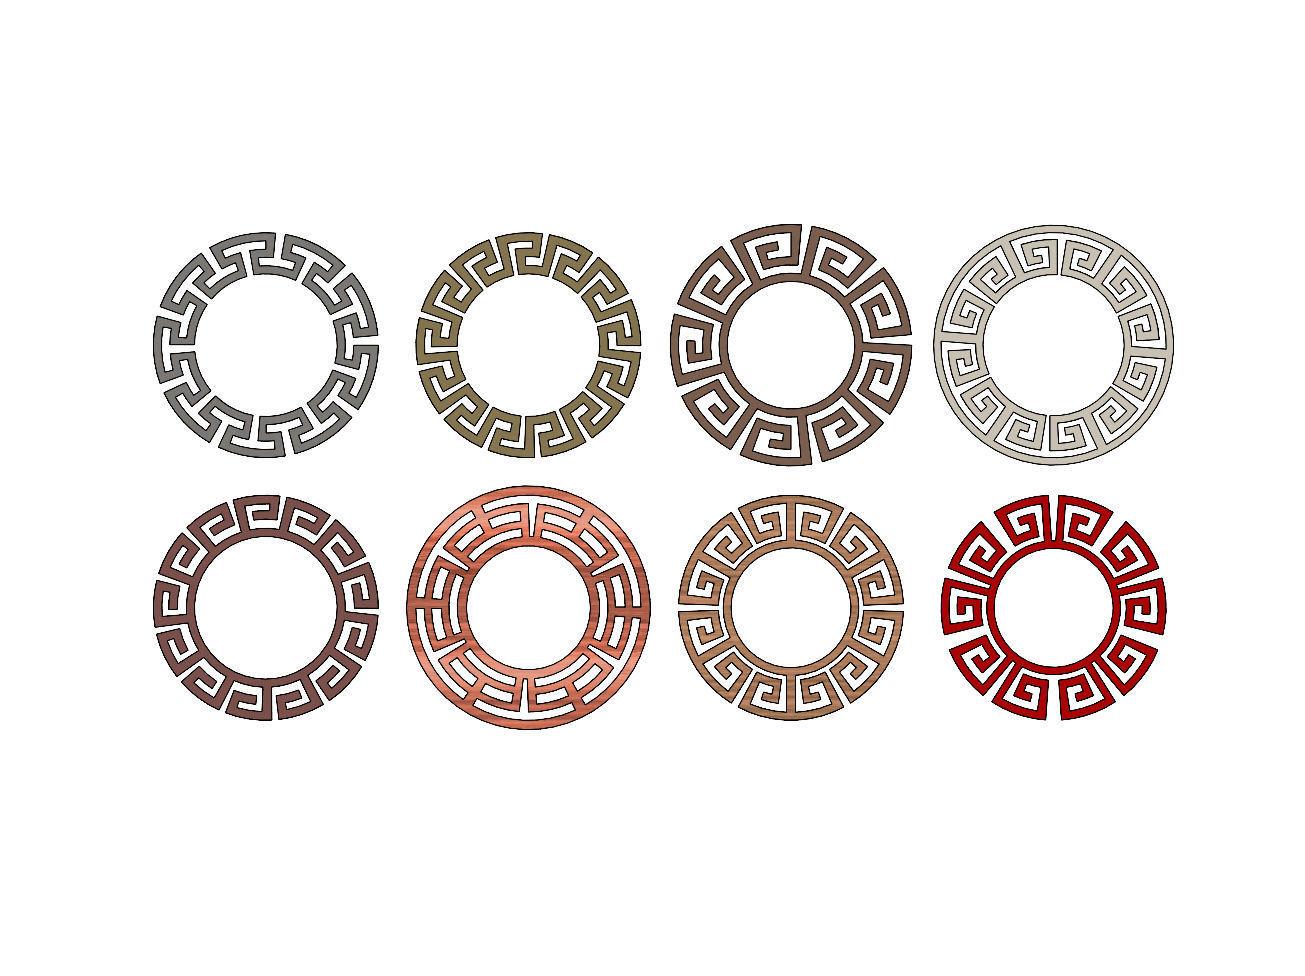 Meandre Greek key pattern circles